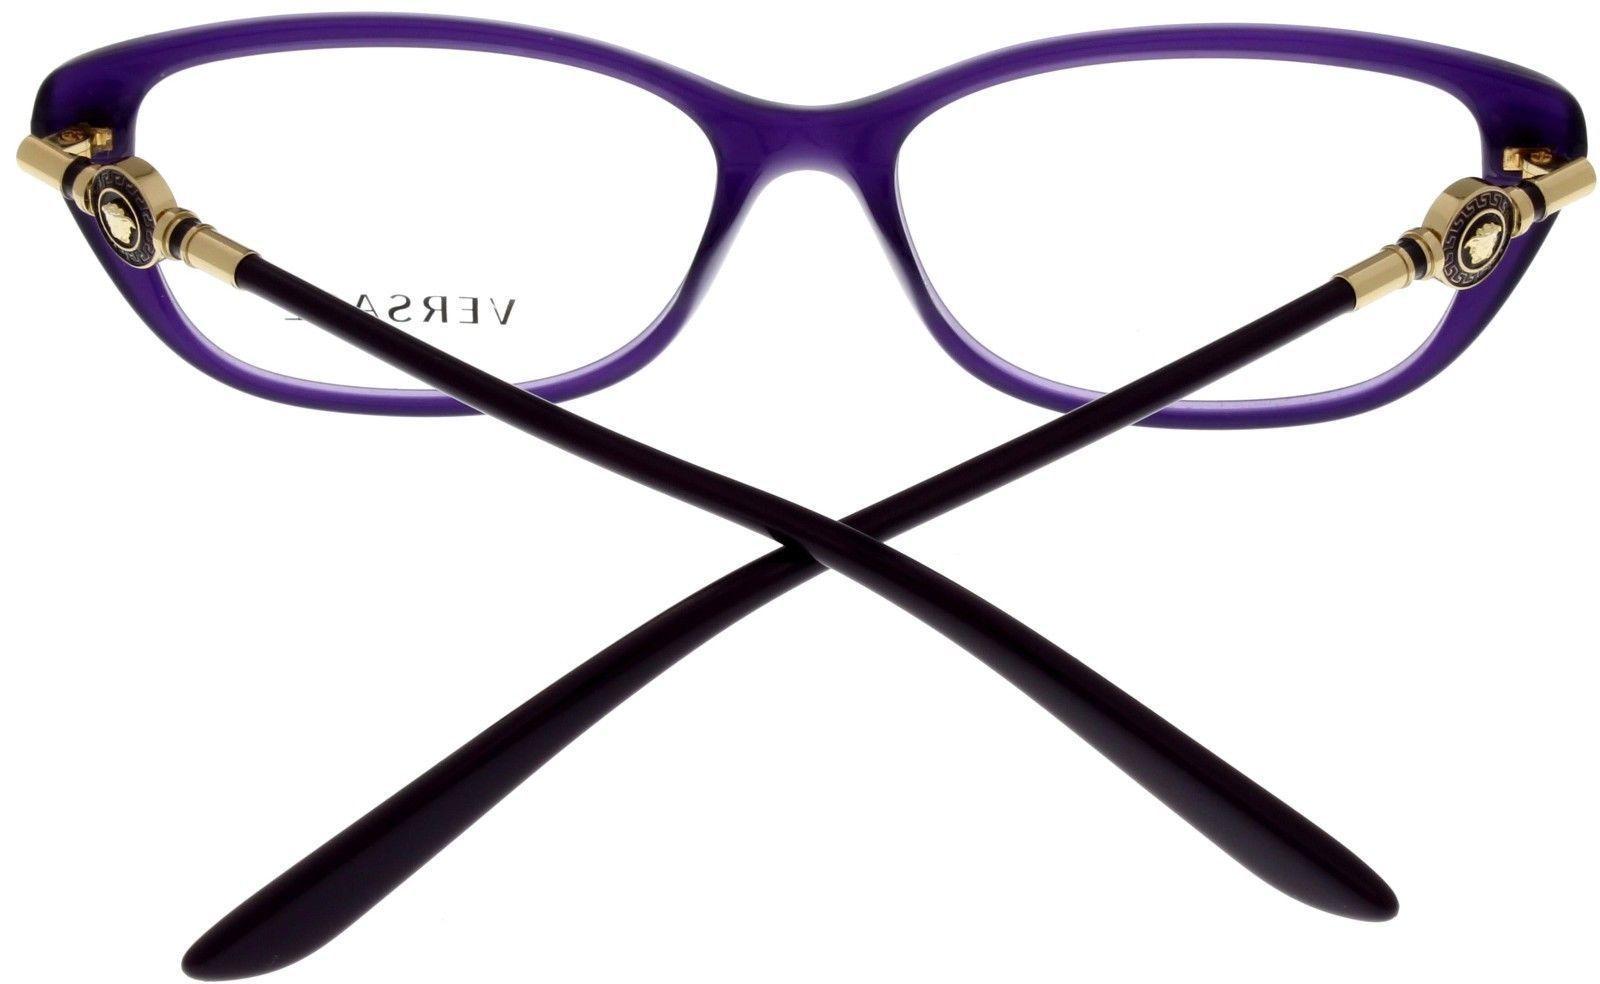 Versace Eyeglasses Frame VE3206 5095 Rectangular Opal Violet Fashion Women